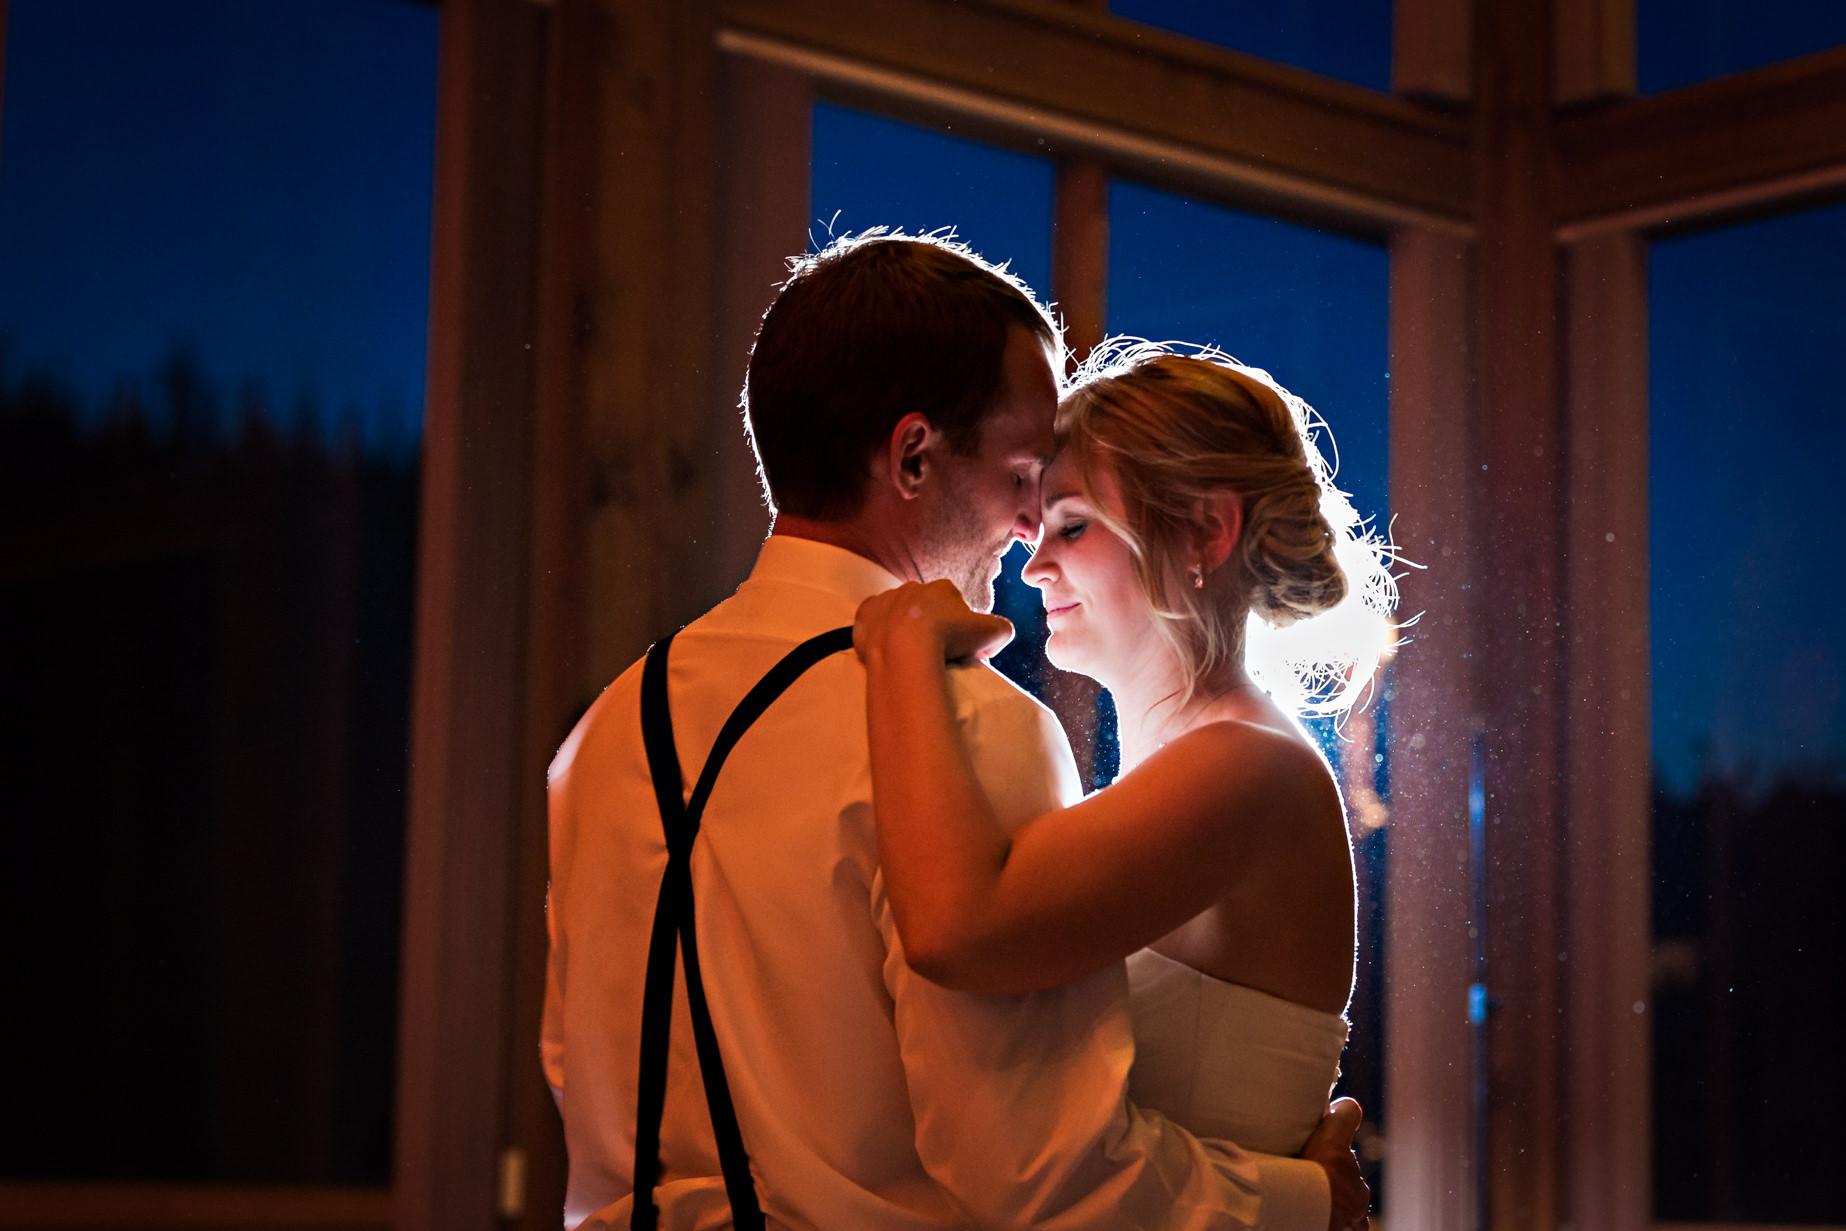 big-sky-resort-wedding-bride-groom-first-dance.jpg